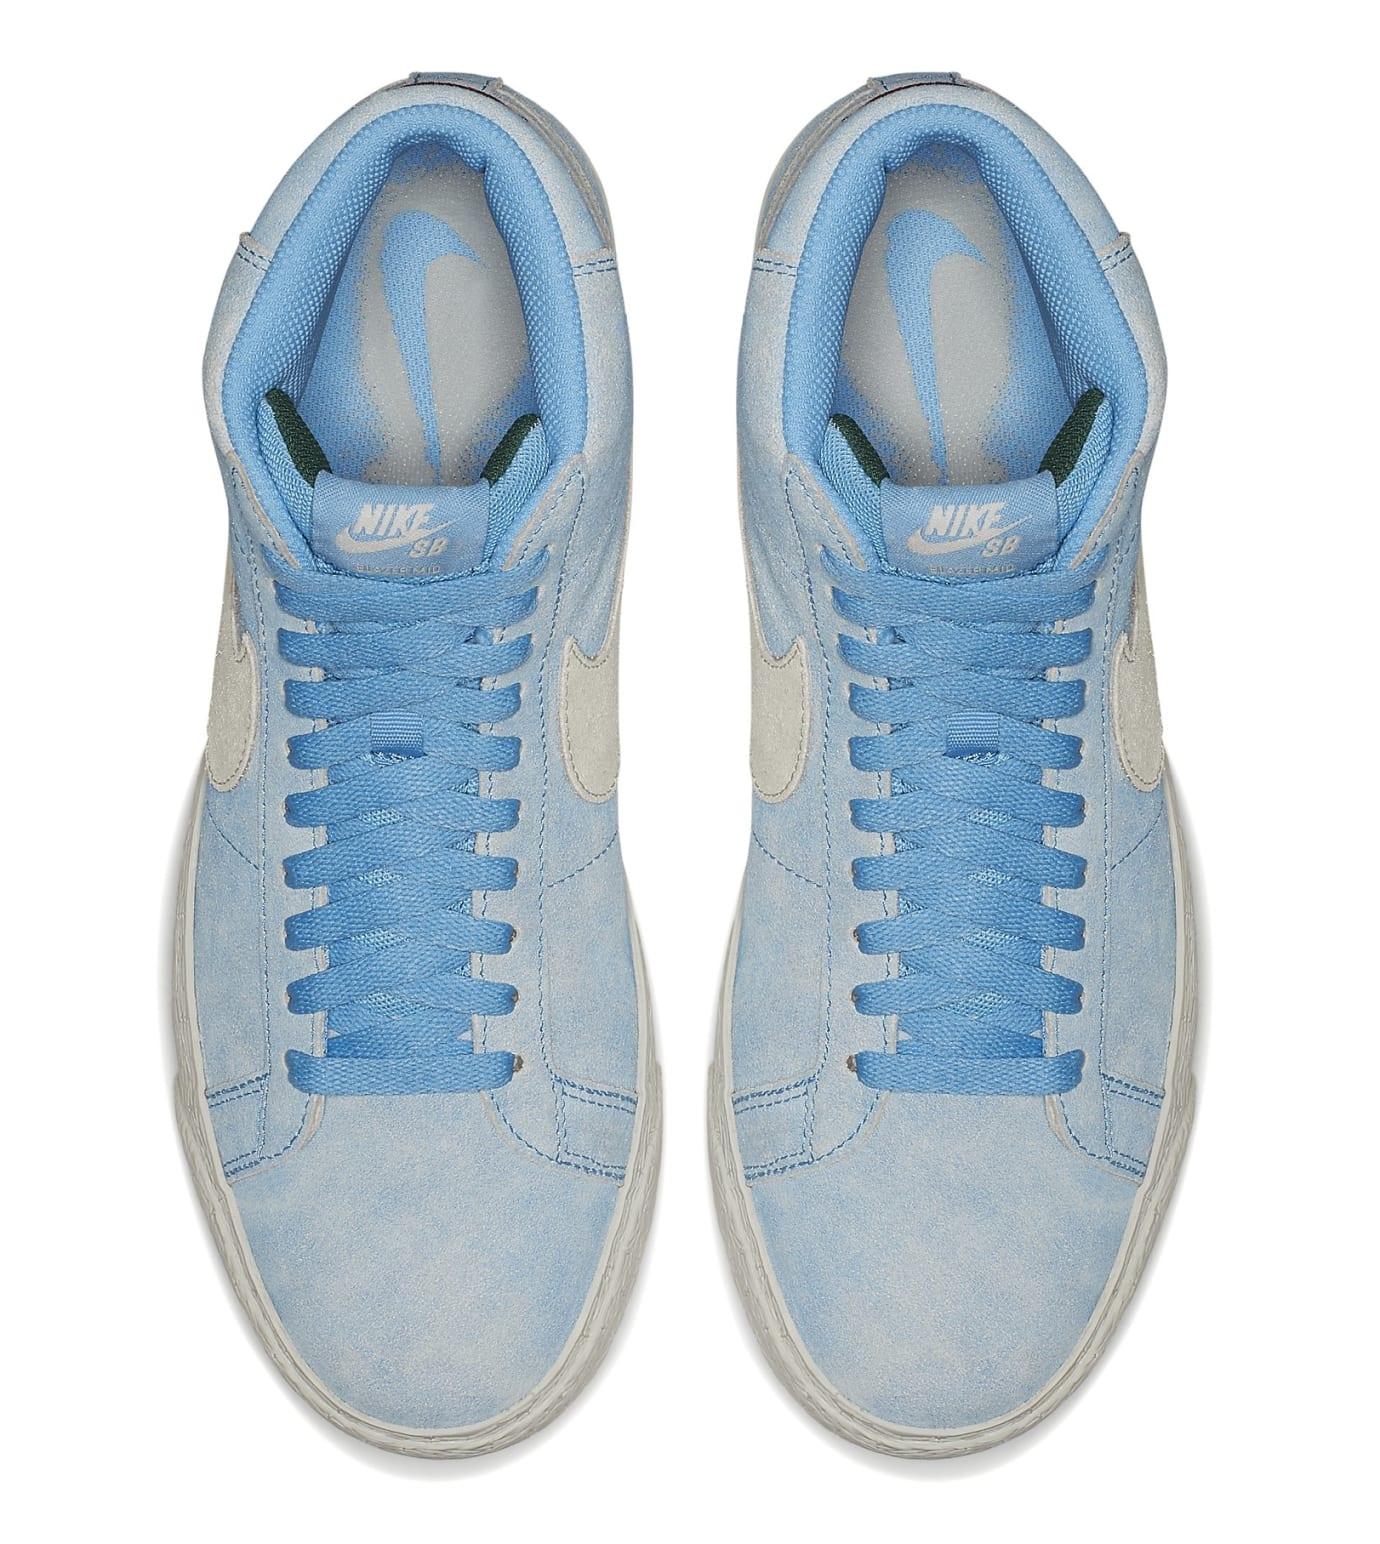 Nike MEN'S SB Zoom Blazer Mid LANCE MOUNTAIN English Rose SIZE 13 BRAND NEW